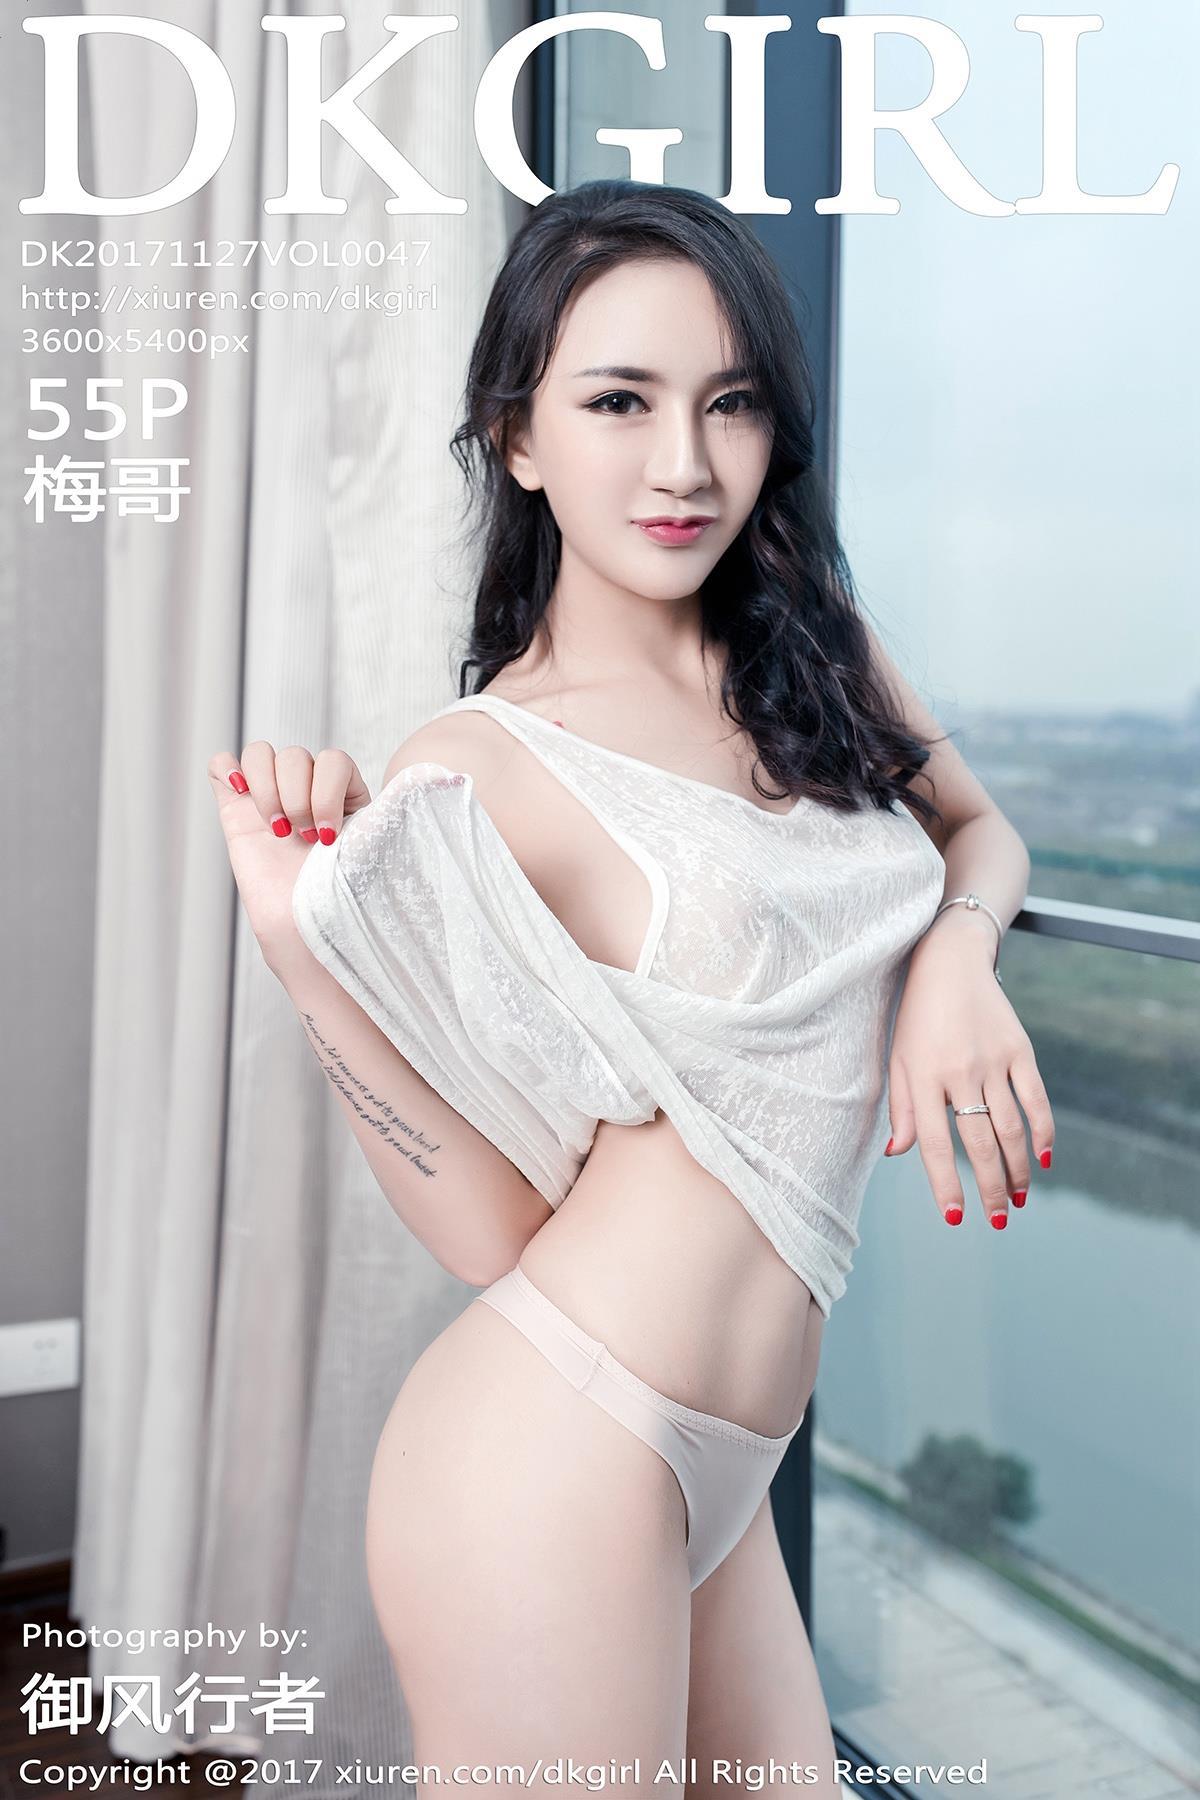 [DKGirl御女郎]DK20171127VOL0047 梅哥 黑色吊带情趣连身袜与性感透视内衣私房写真集